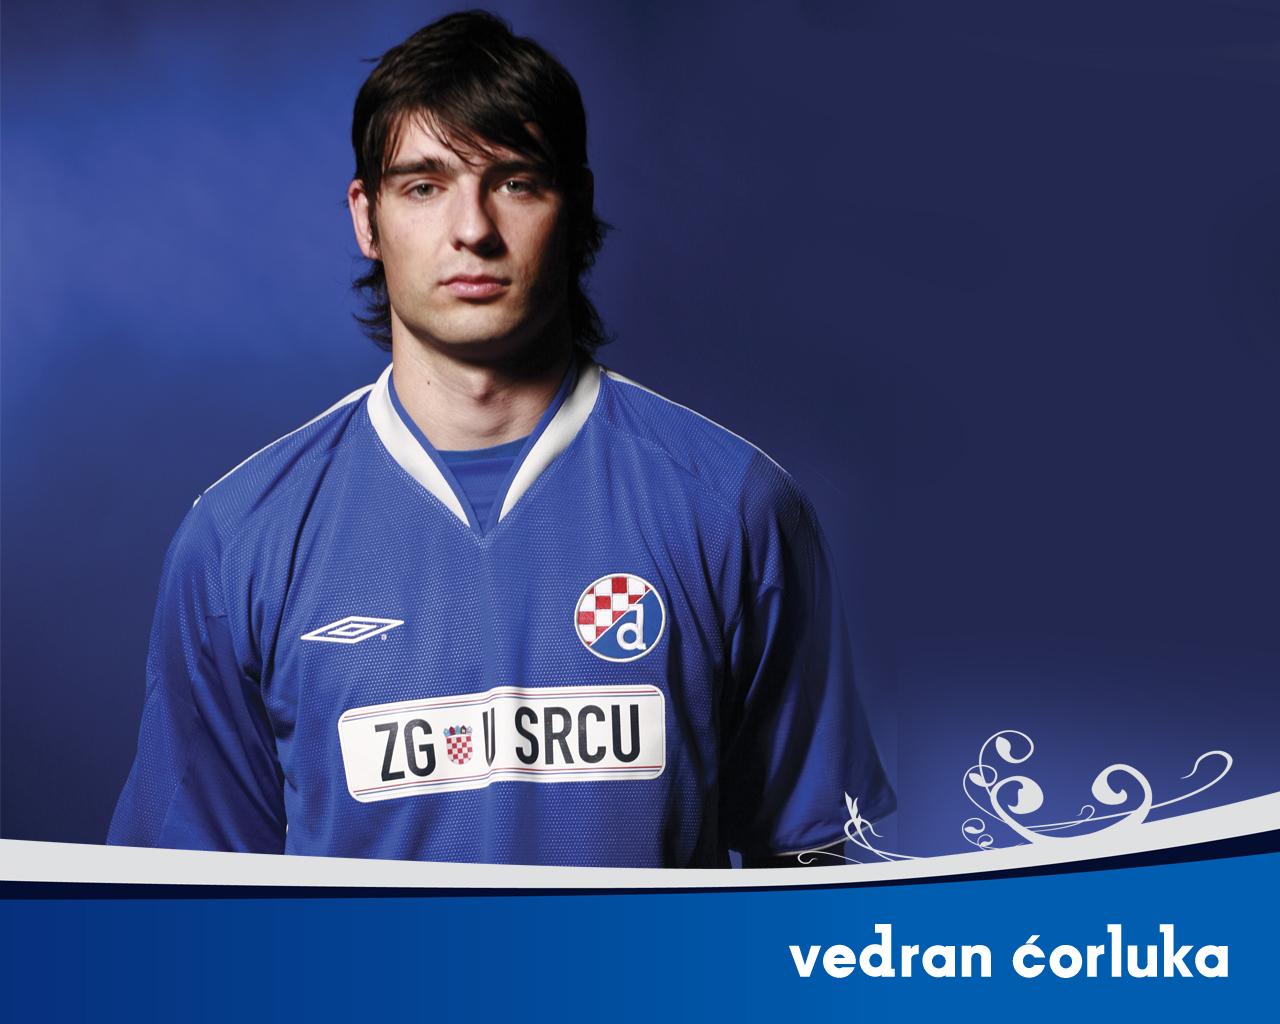 Chùm ảnh: Dinamo Zagreb jersey (64)